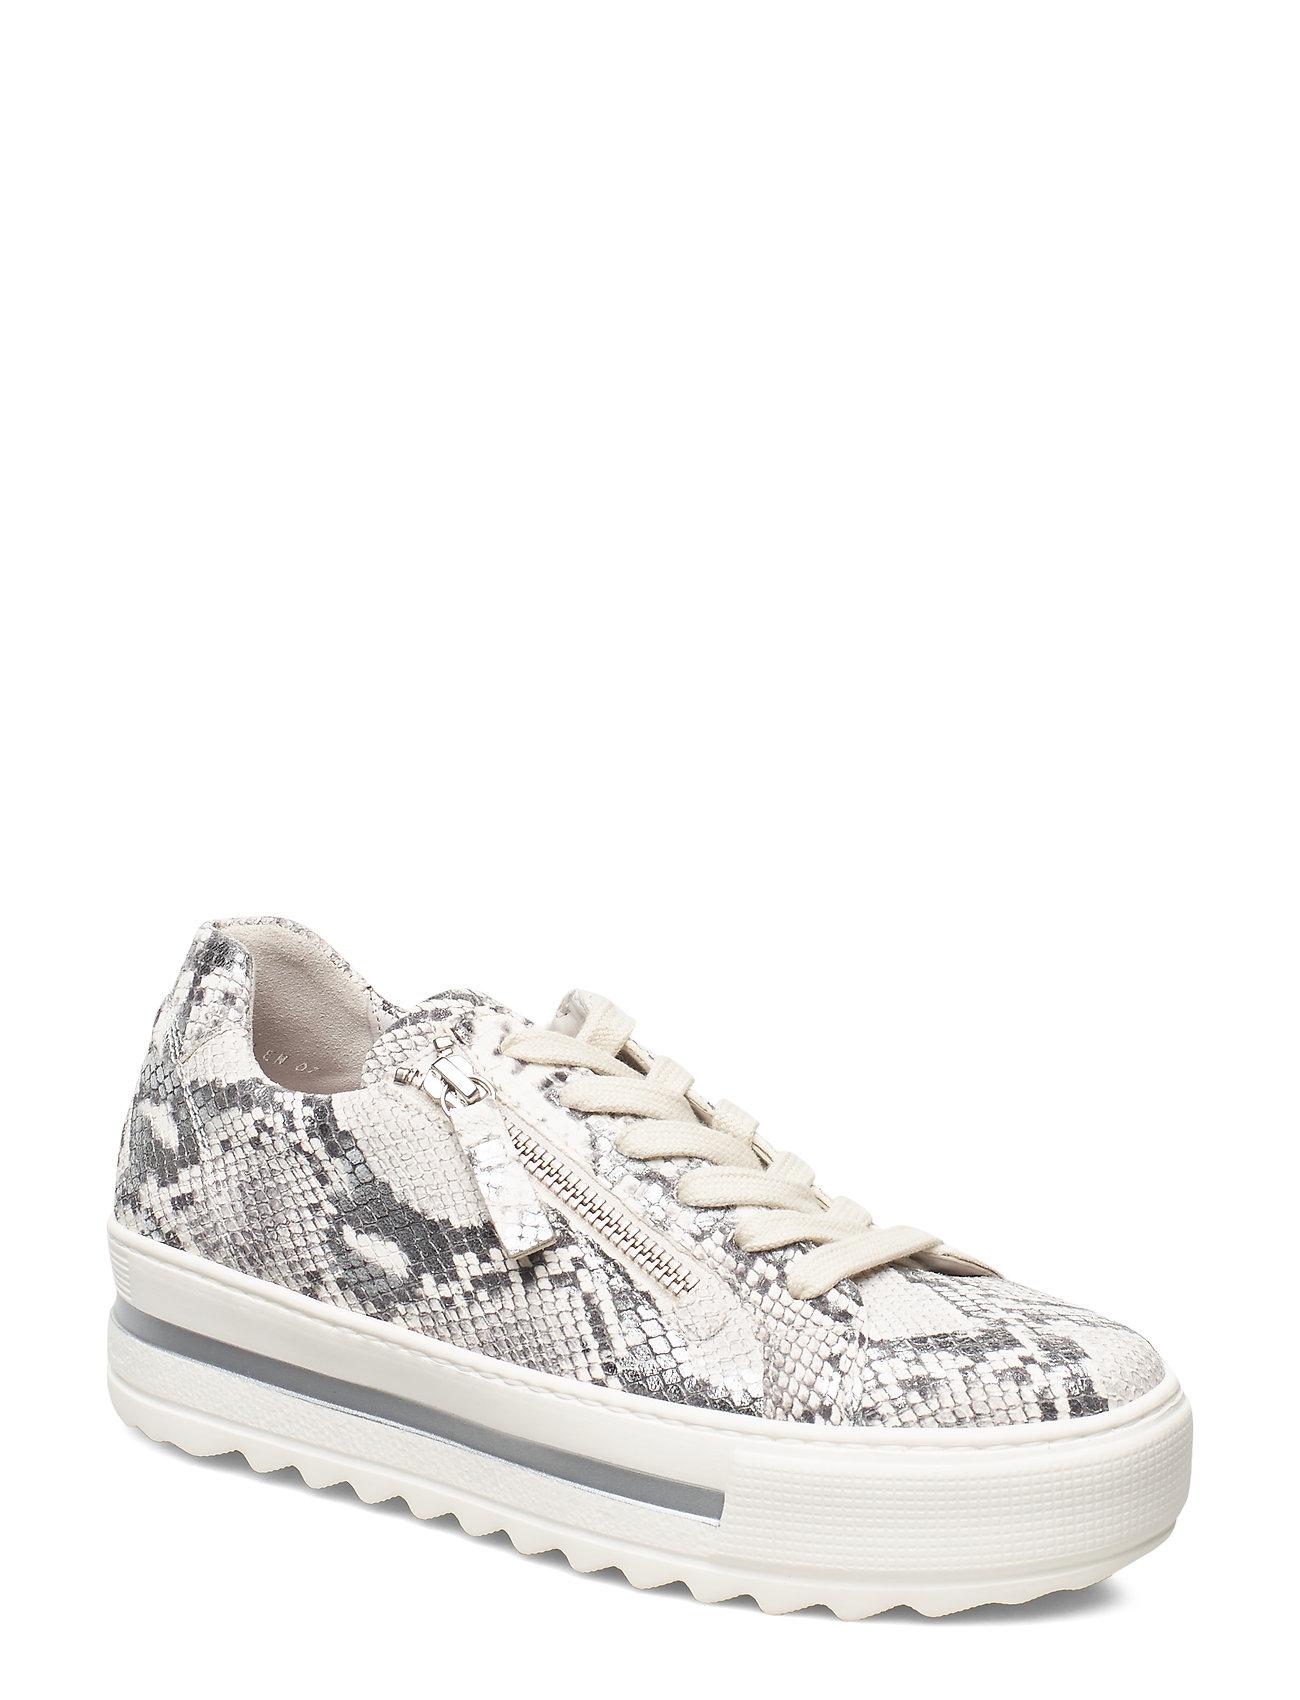 Image of Sneaker Low-top Sneakers Beige Gabor (3362440381)